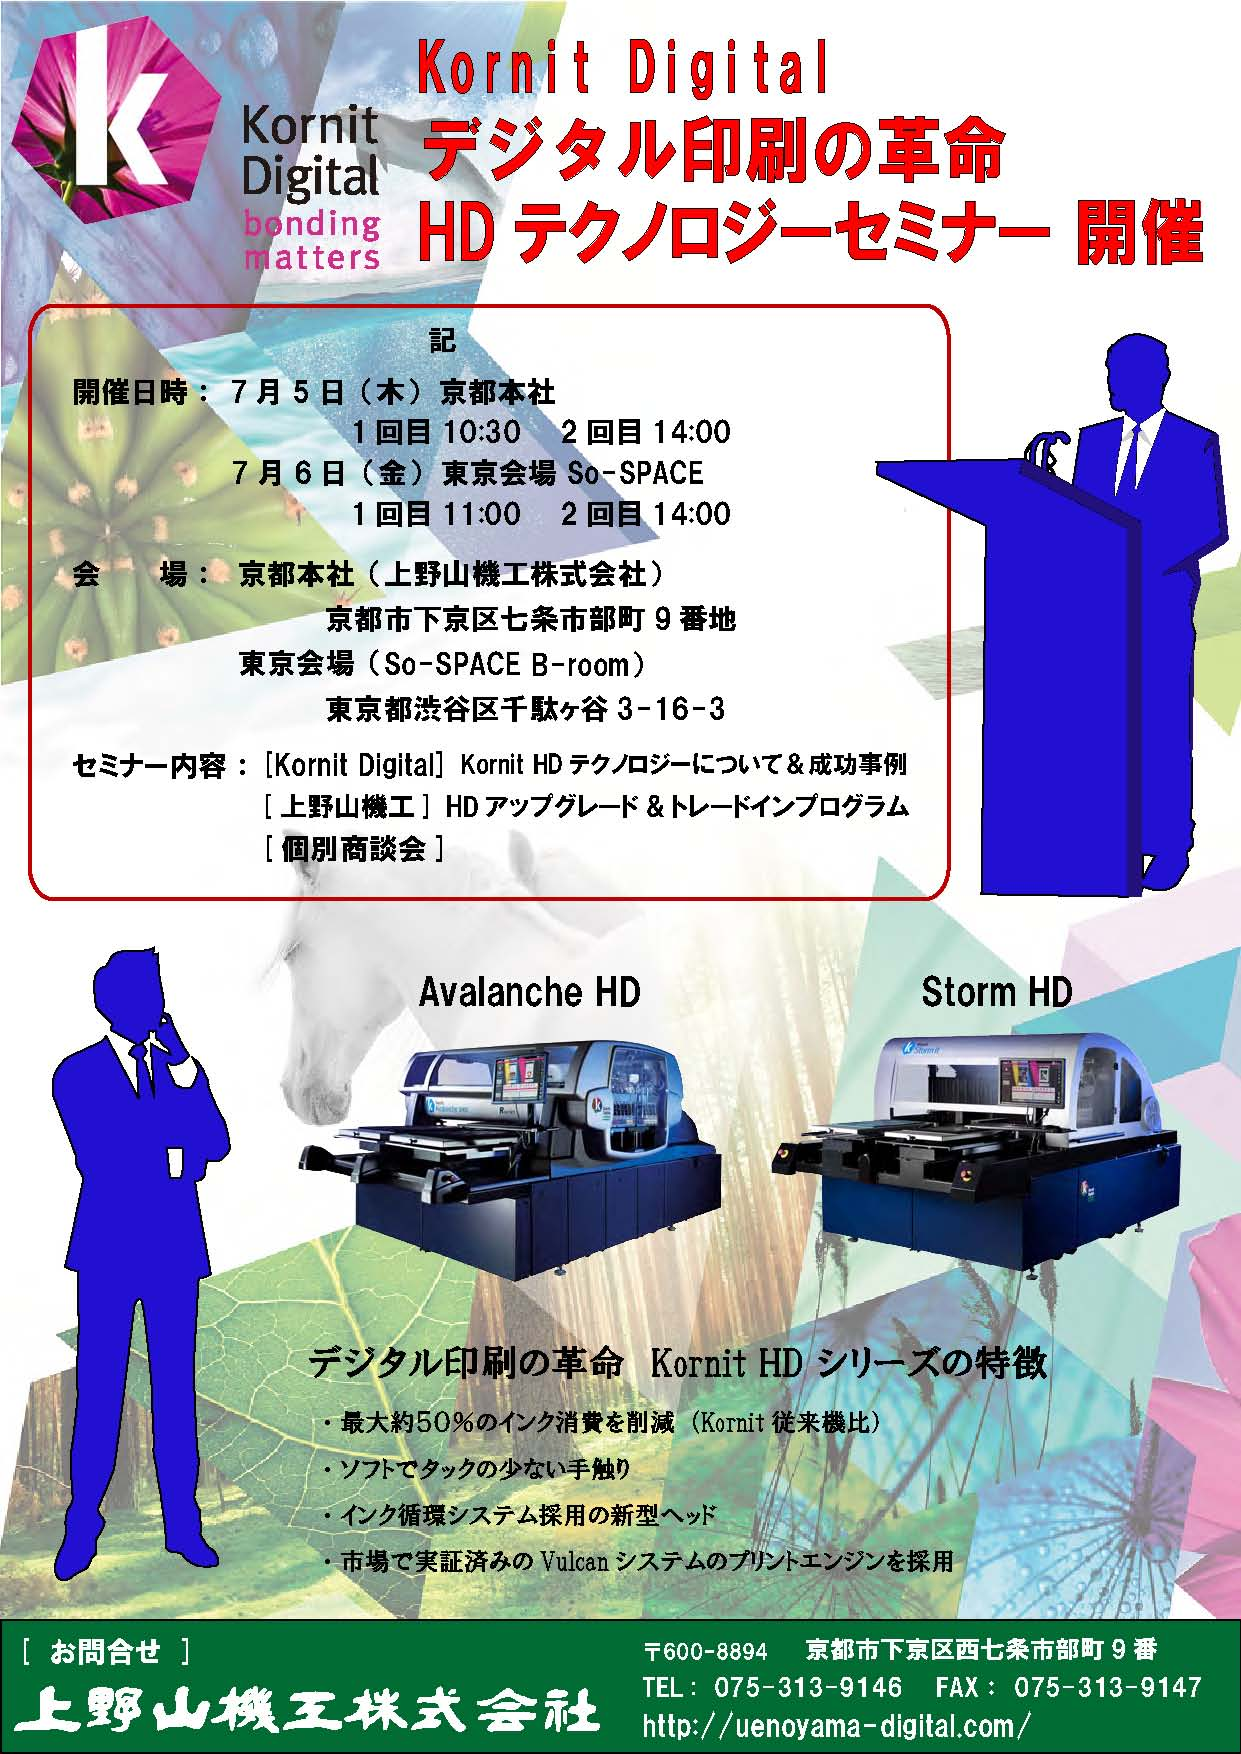 Kornit HD テクノロジーセミナー開催